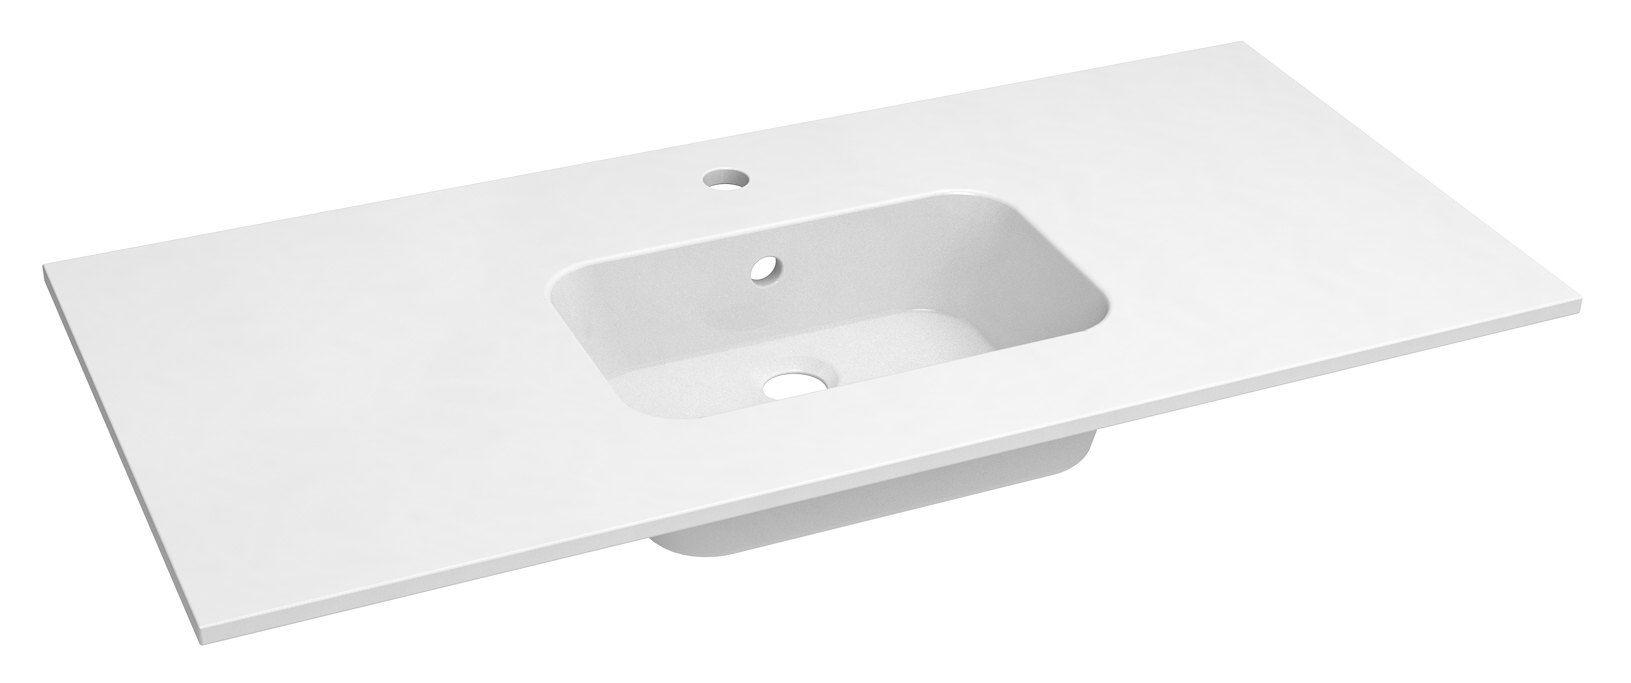 Bad - Waschbecken Dhule 16, Farbe: Weiß – 10 x 101 x 46 cm (H x B x T)